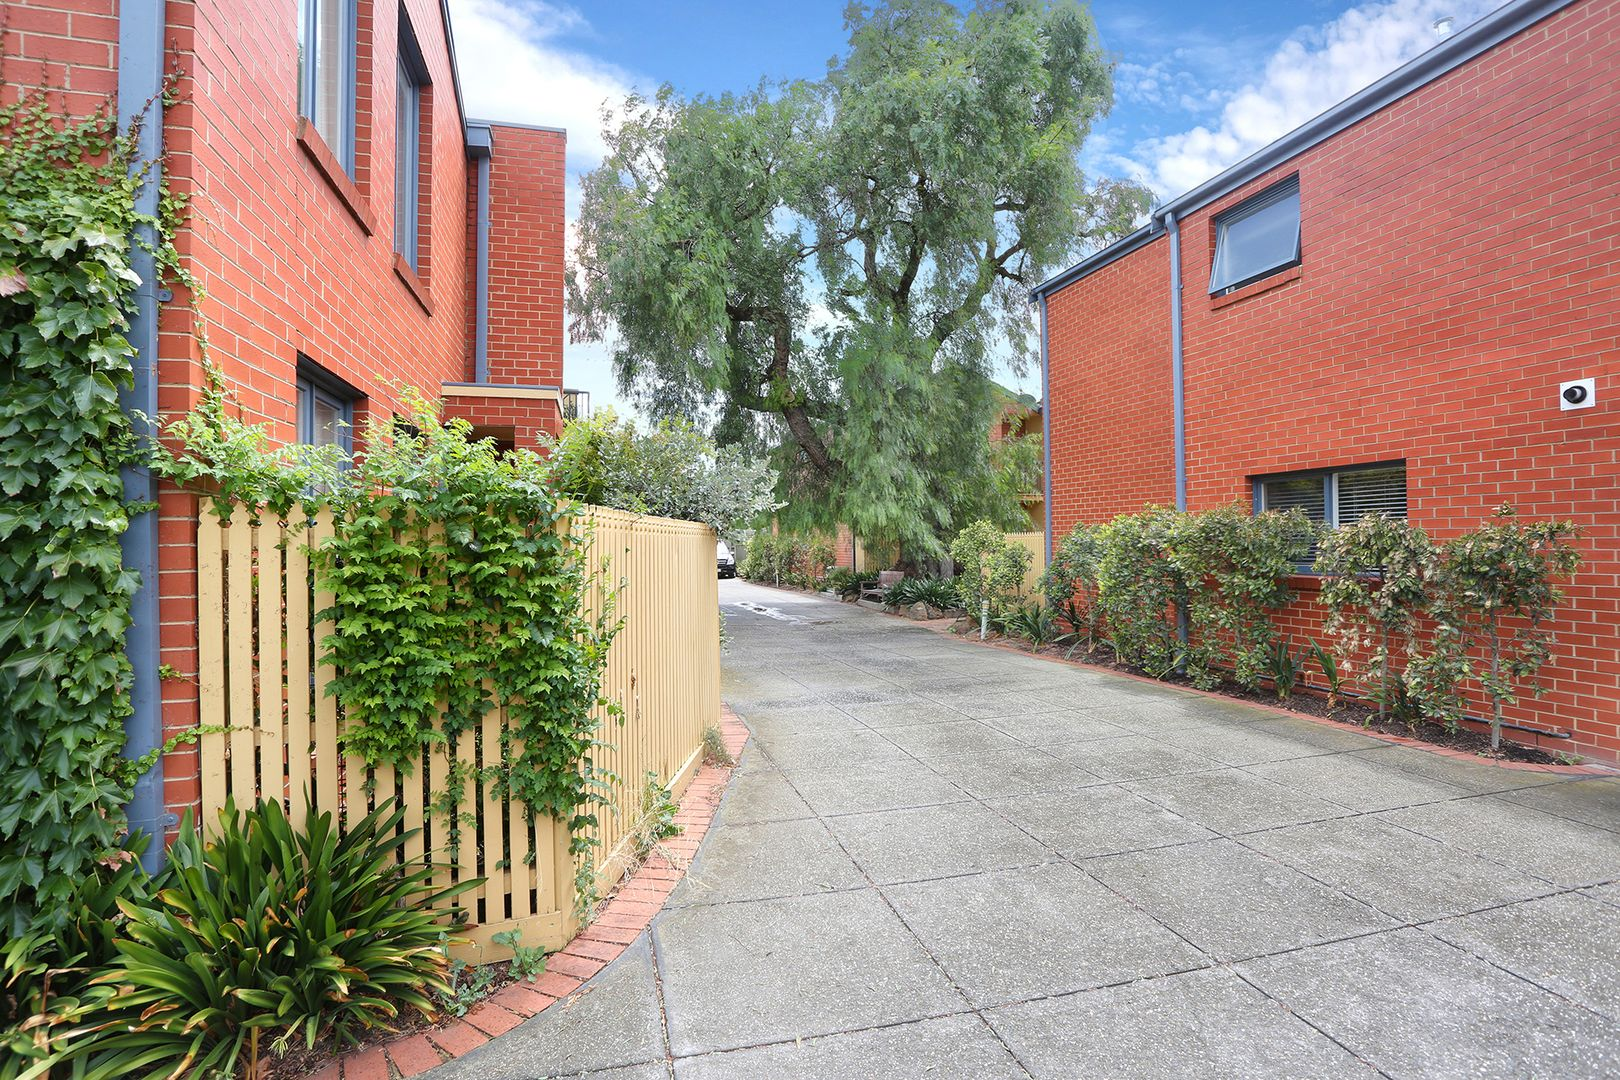 5/221 McKean Street, Fitzroy North VIC 3068, Image 1